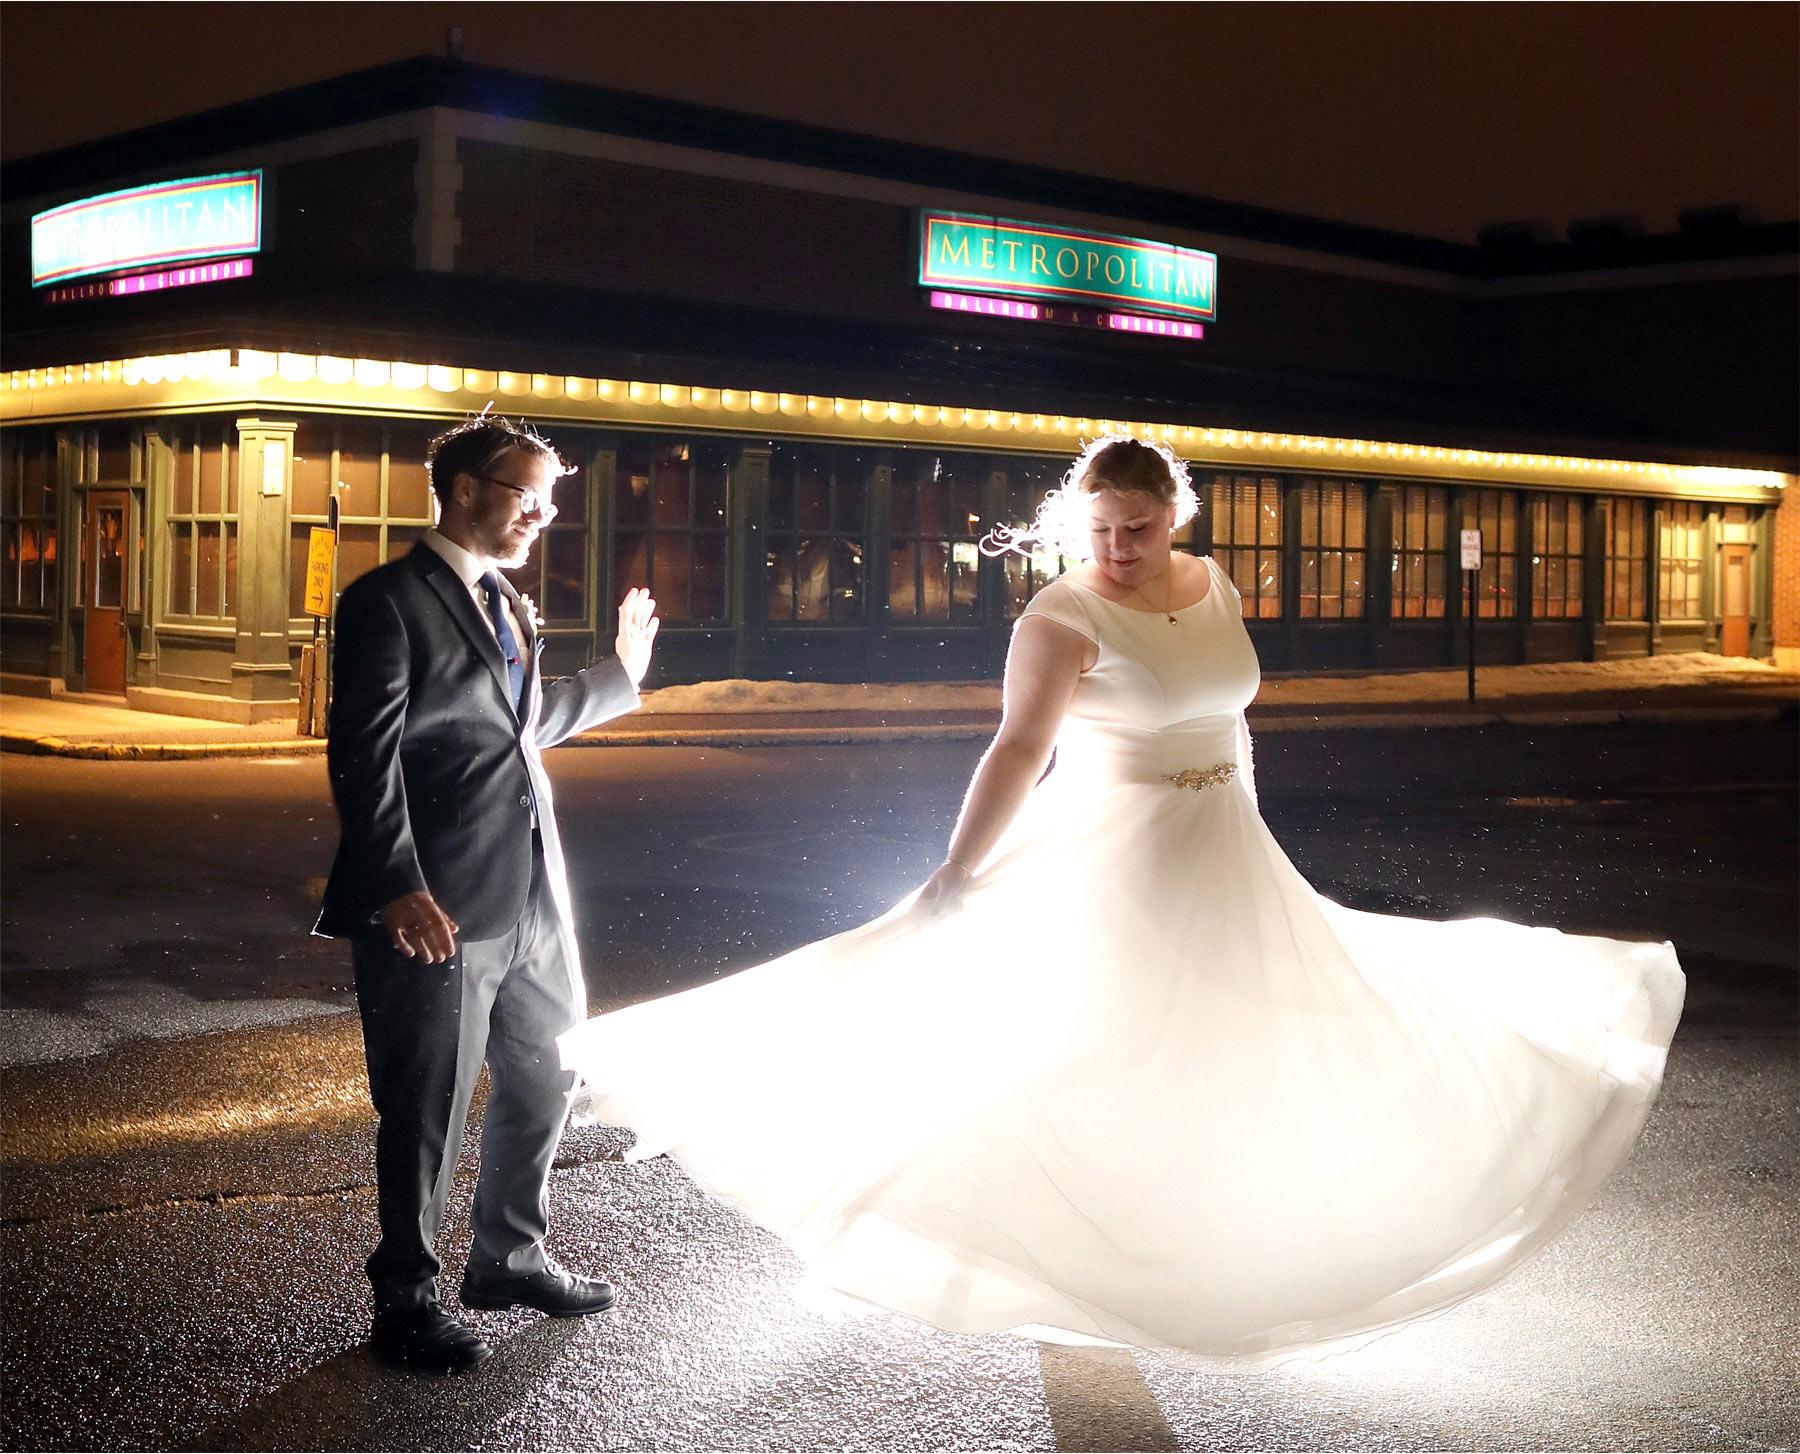 17-Minneapolis-Wedding-Photography-by-Vick-Photography-Metropolitan-Ballroom-Dance-Libby-and-Nathan.jpg